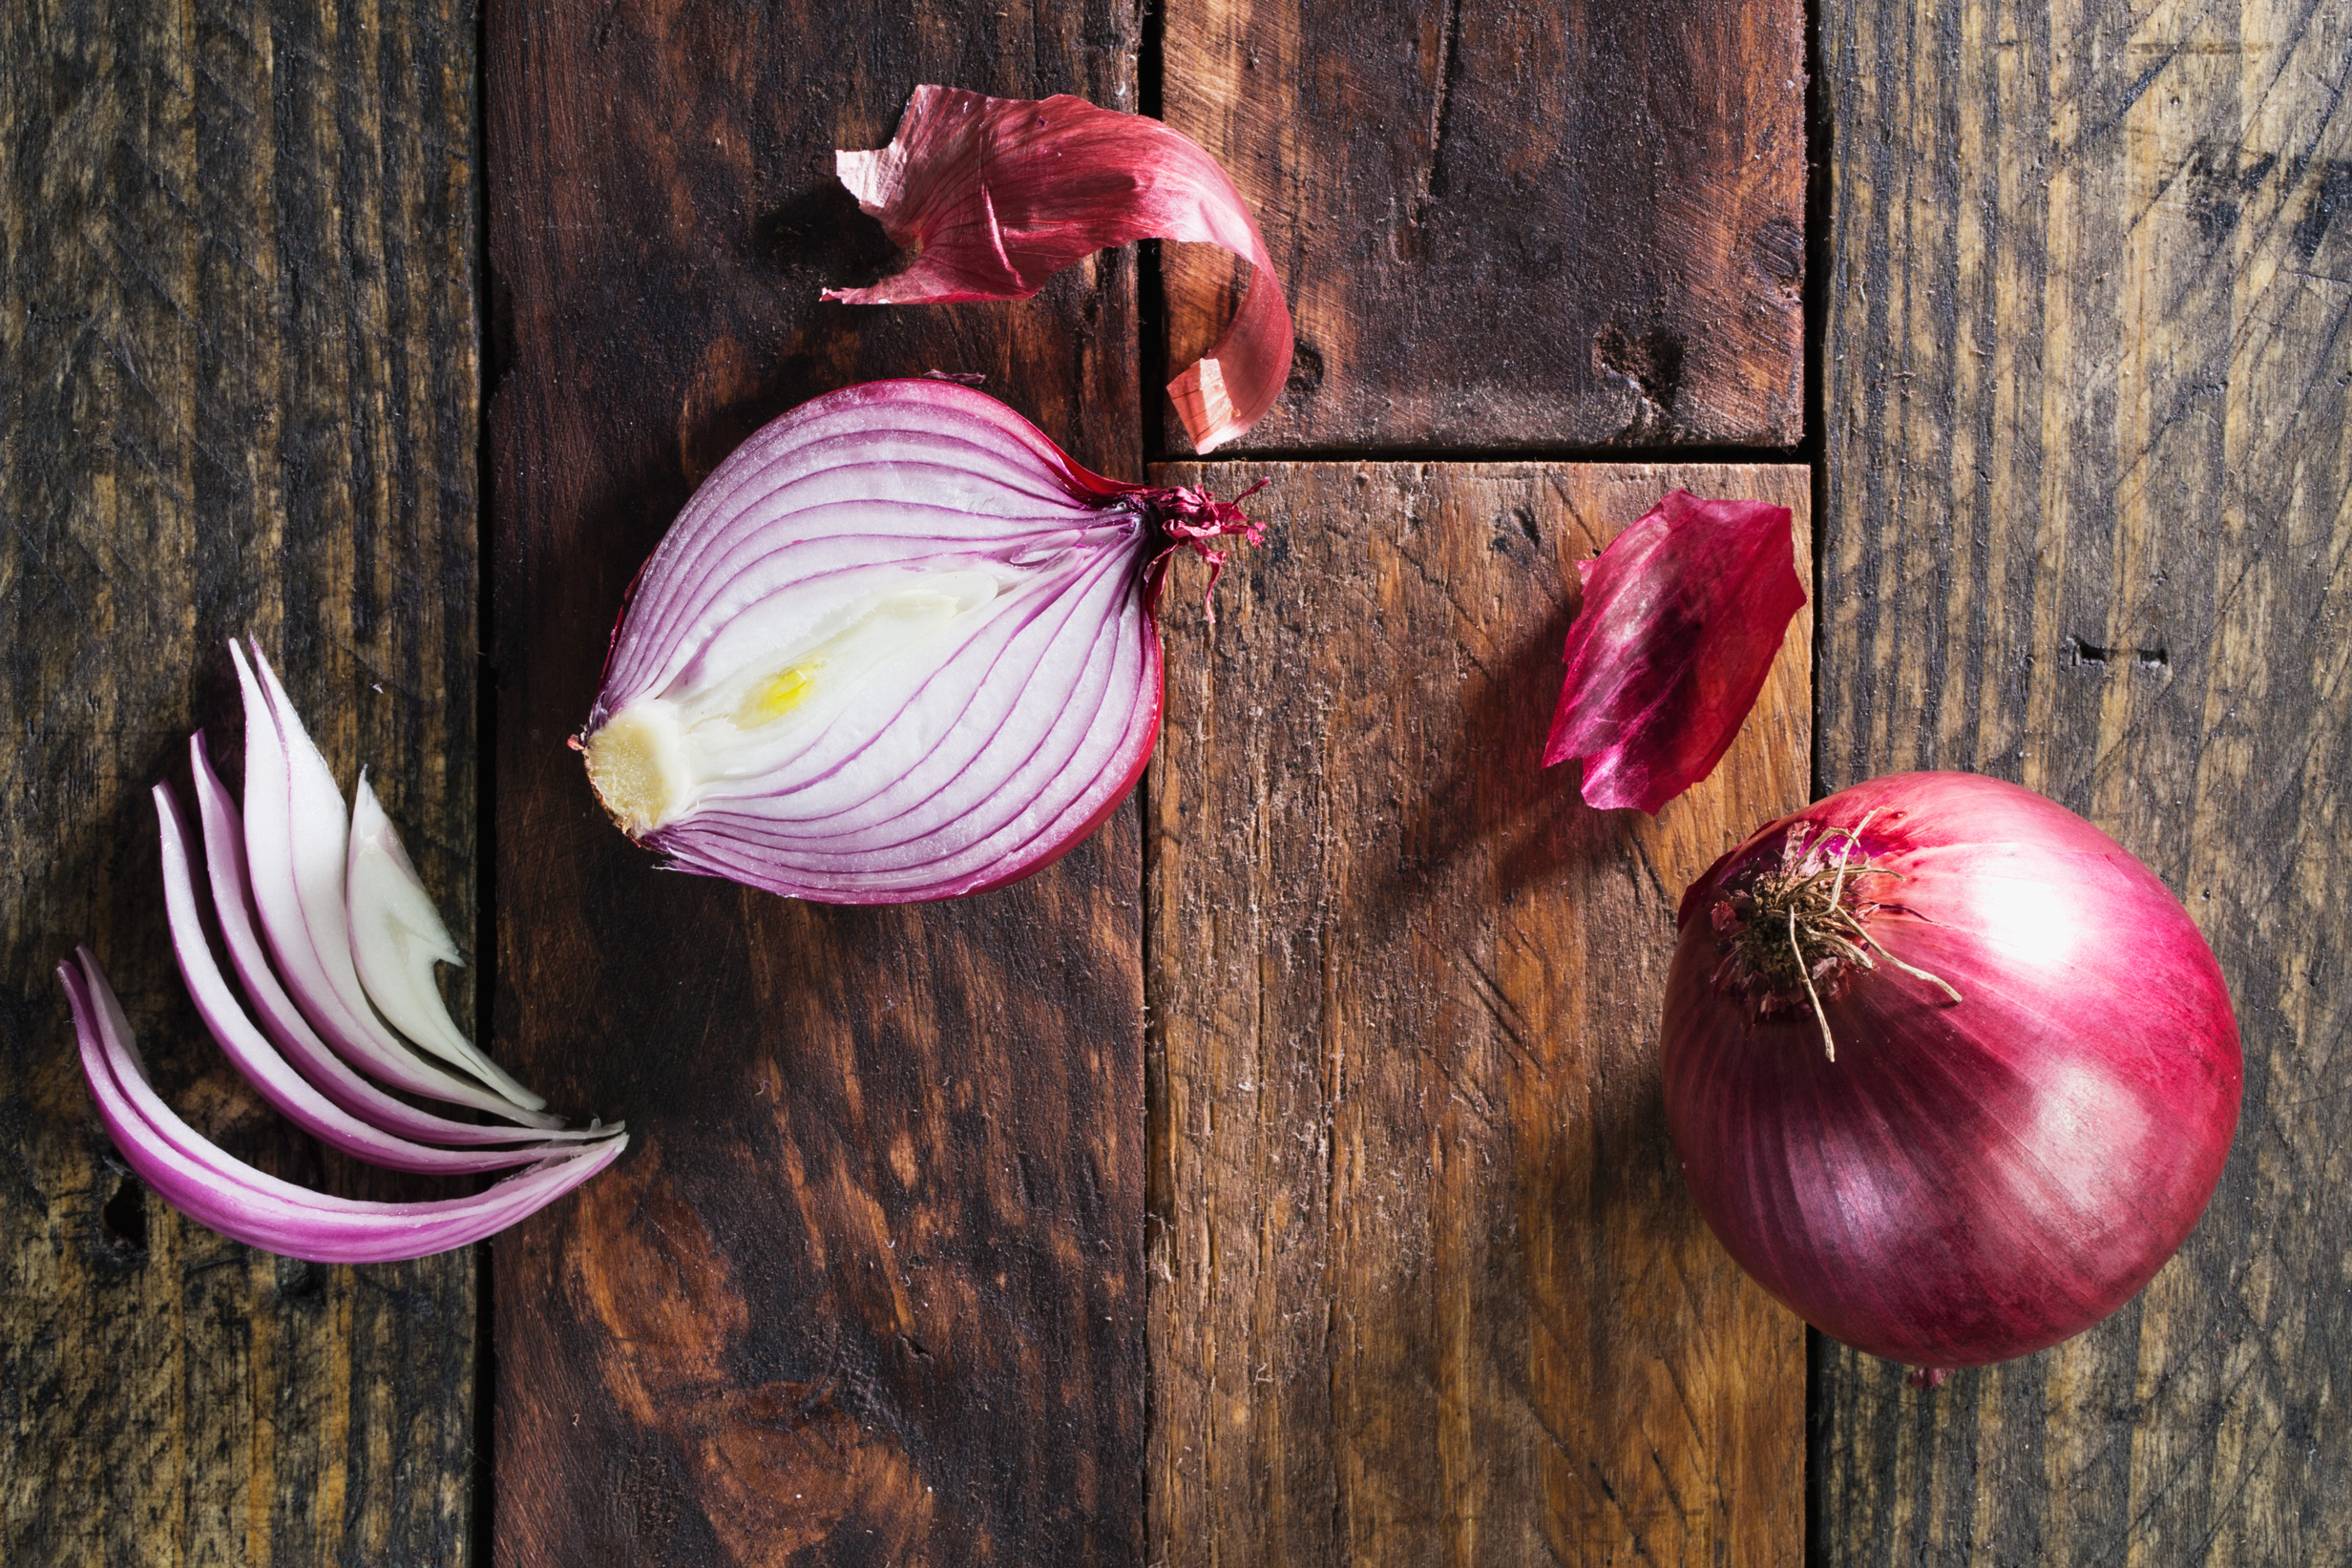 EP-03102015-onions-4-6x4.jpg